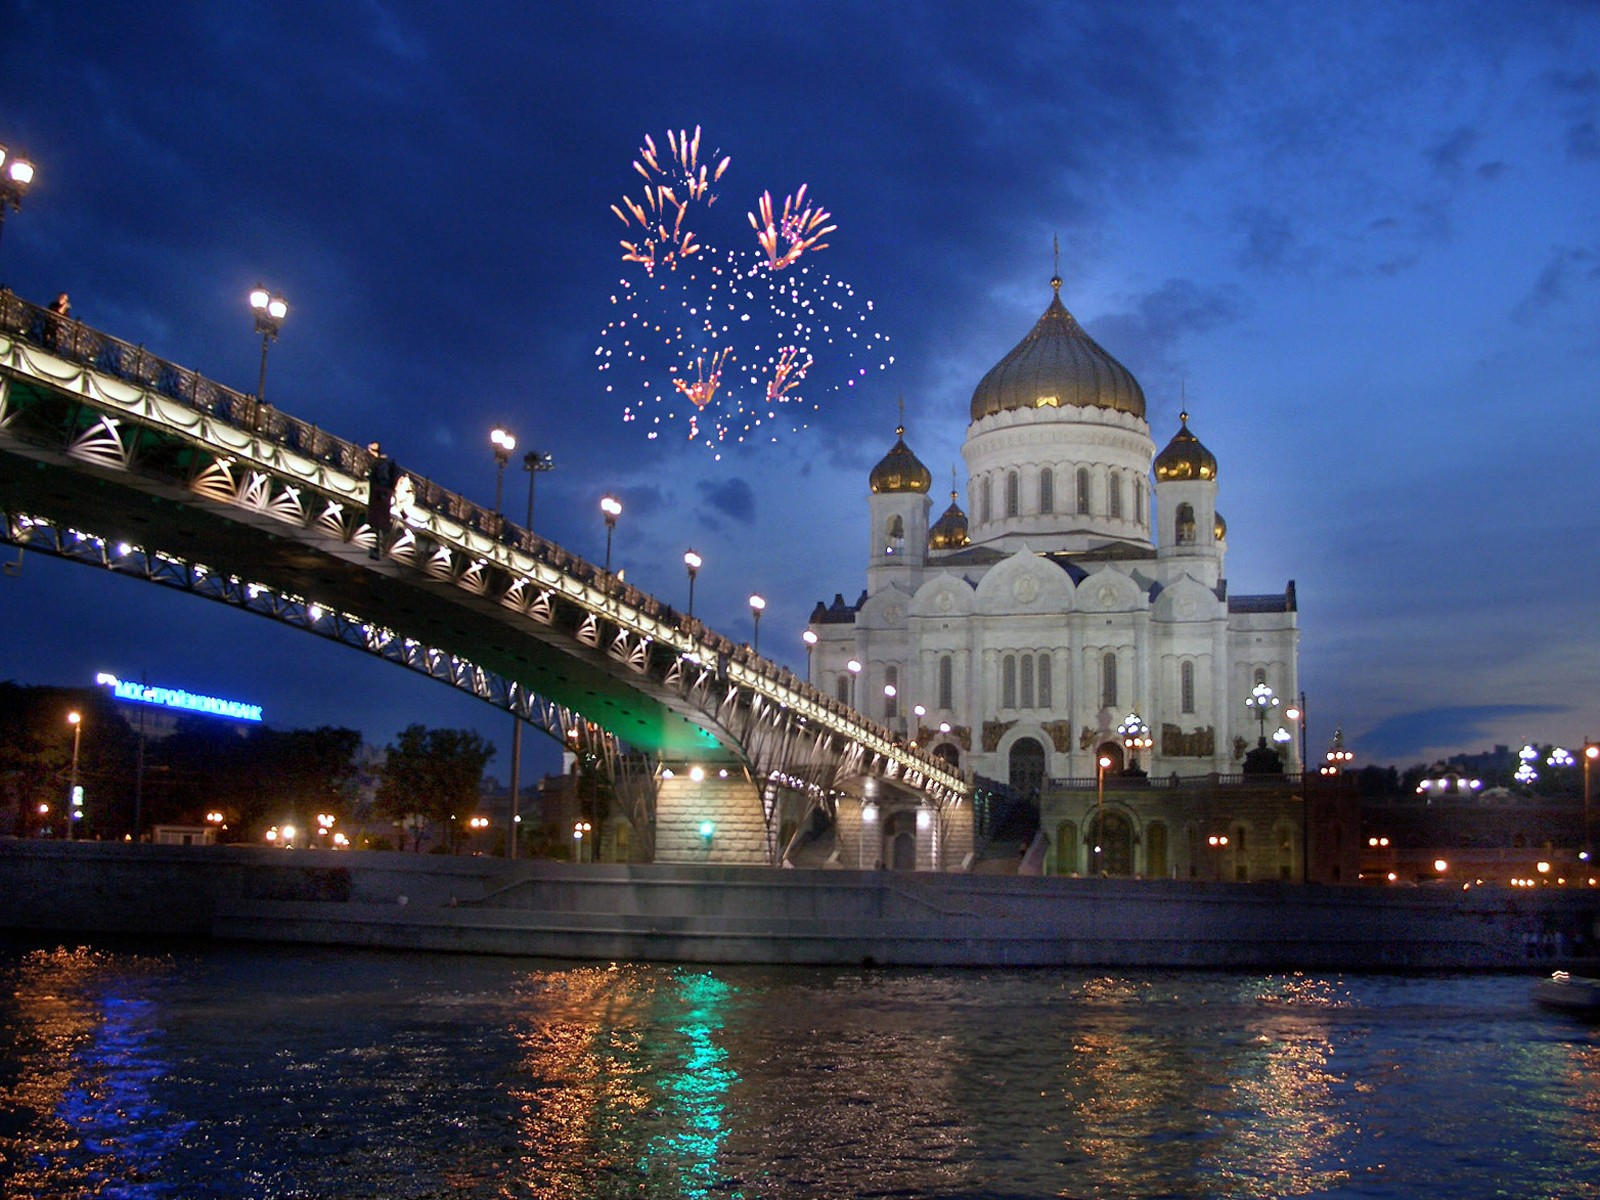 Храм Христа Спасителя, мост, салют